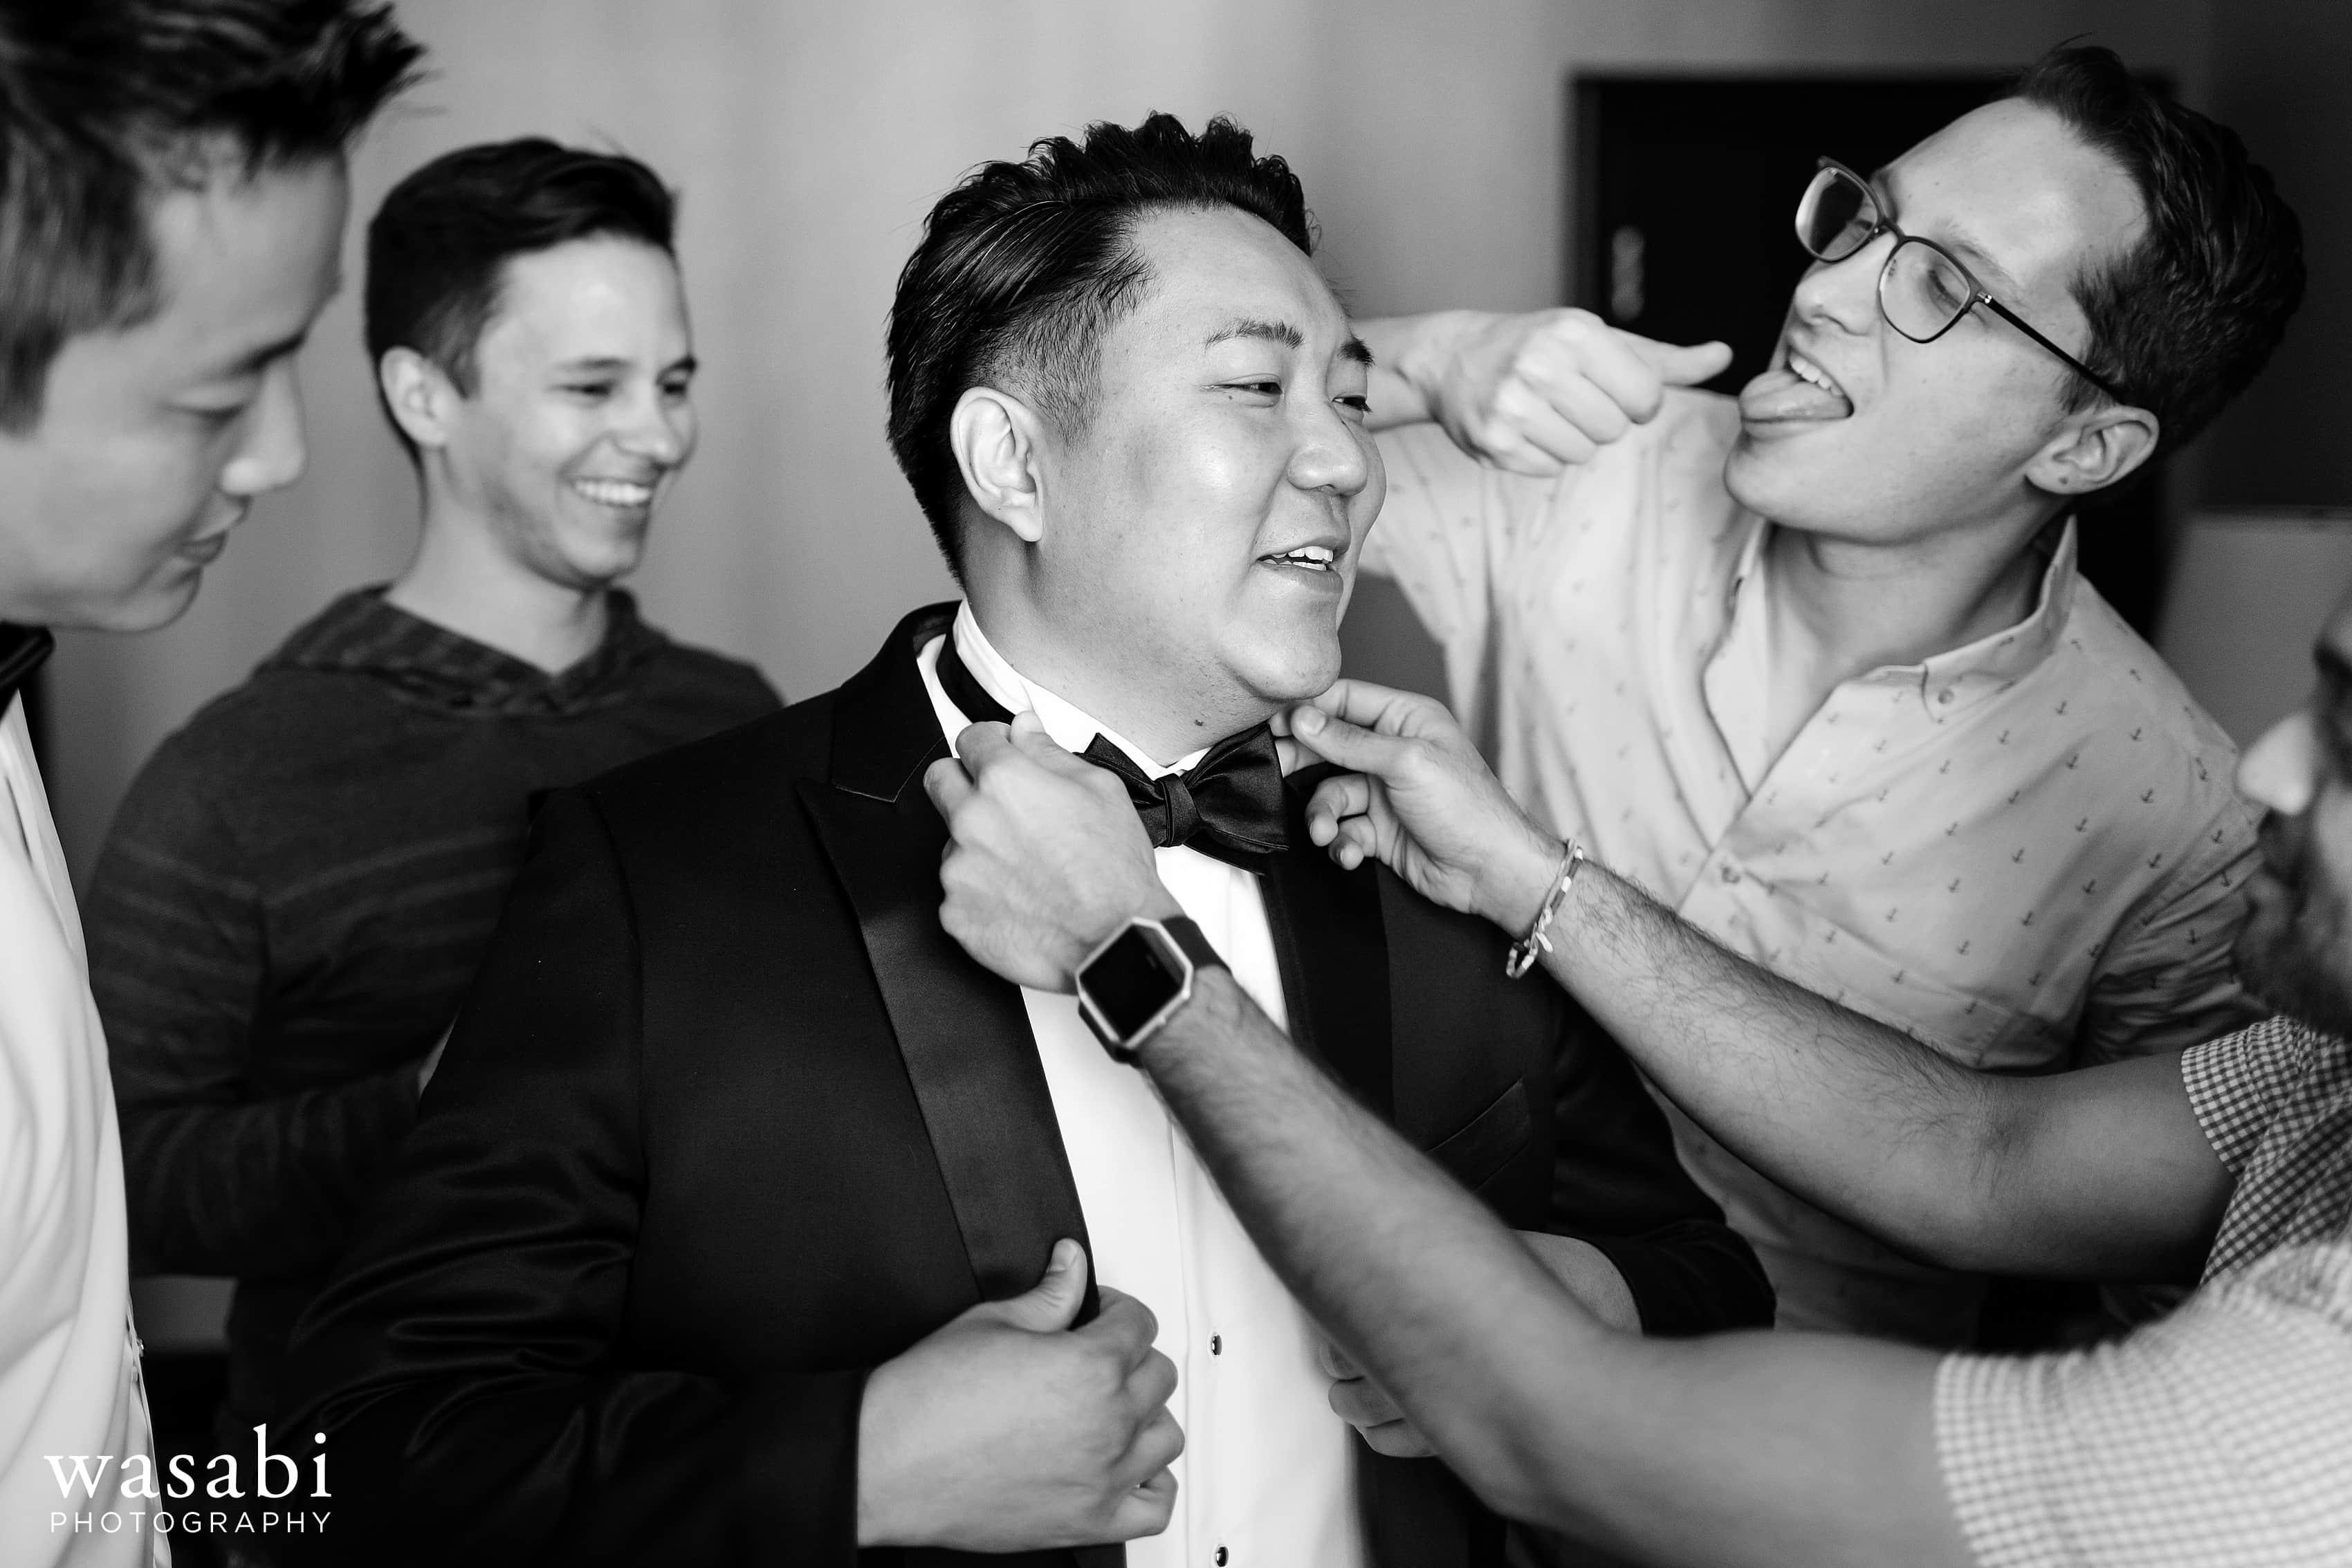 groomsmen help groom adjust bowtie while getting ready for wedding